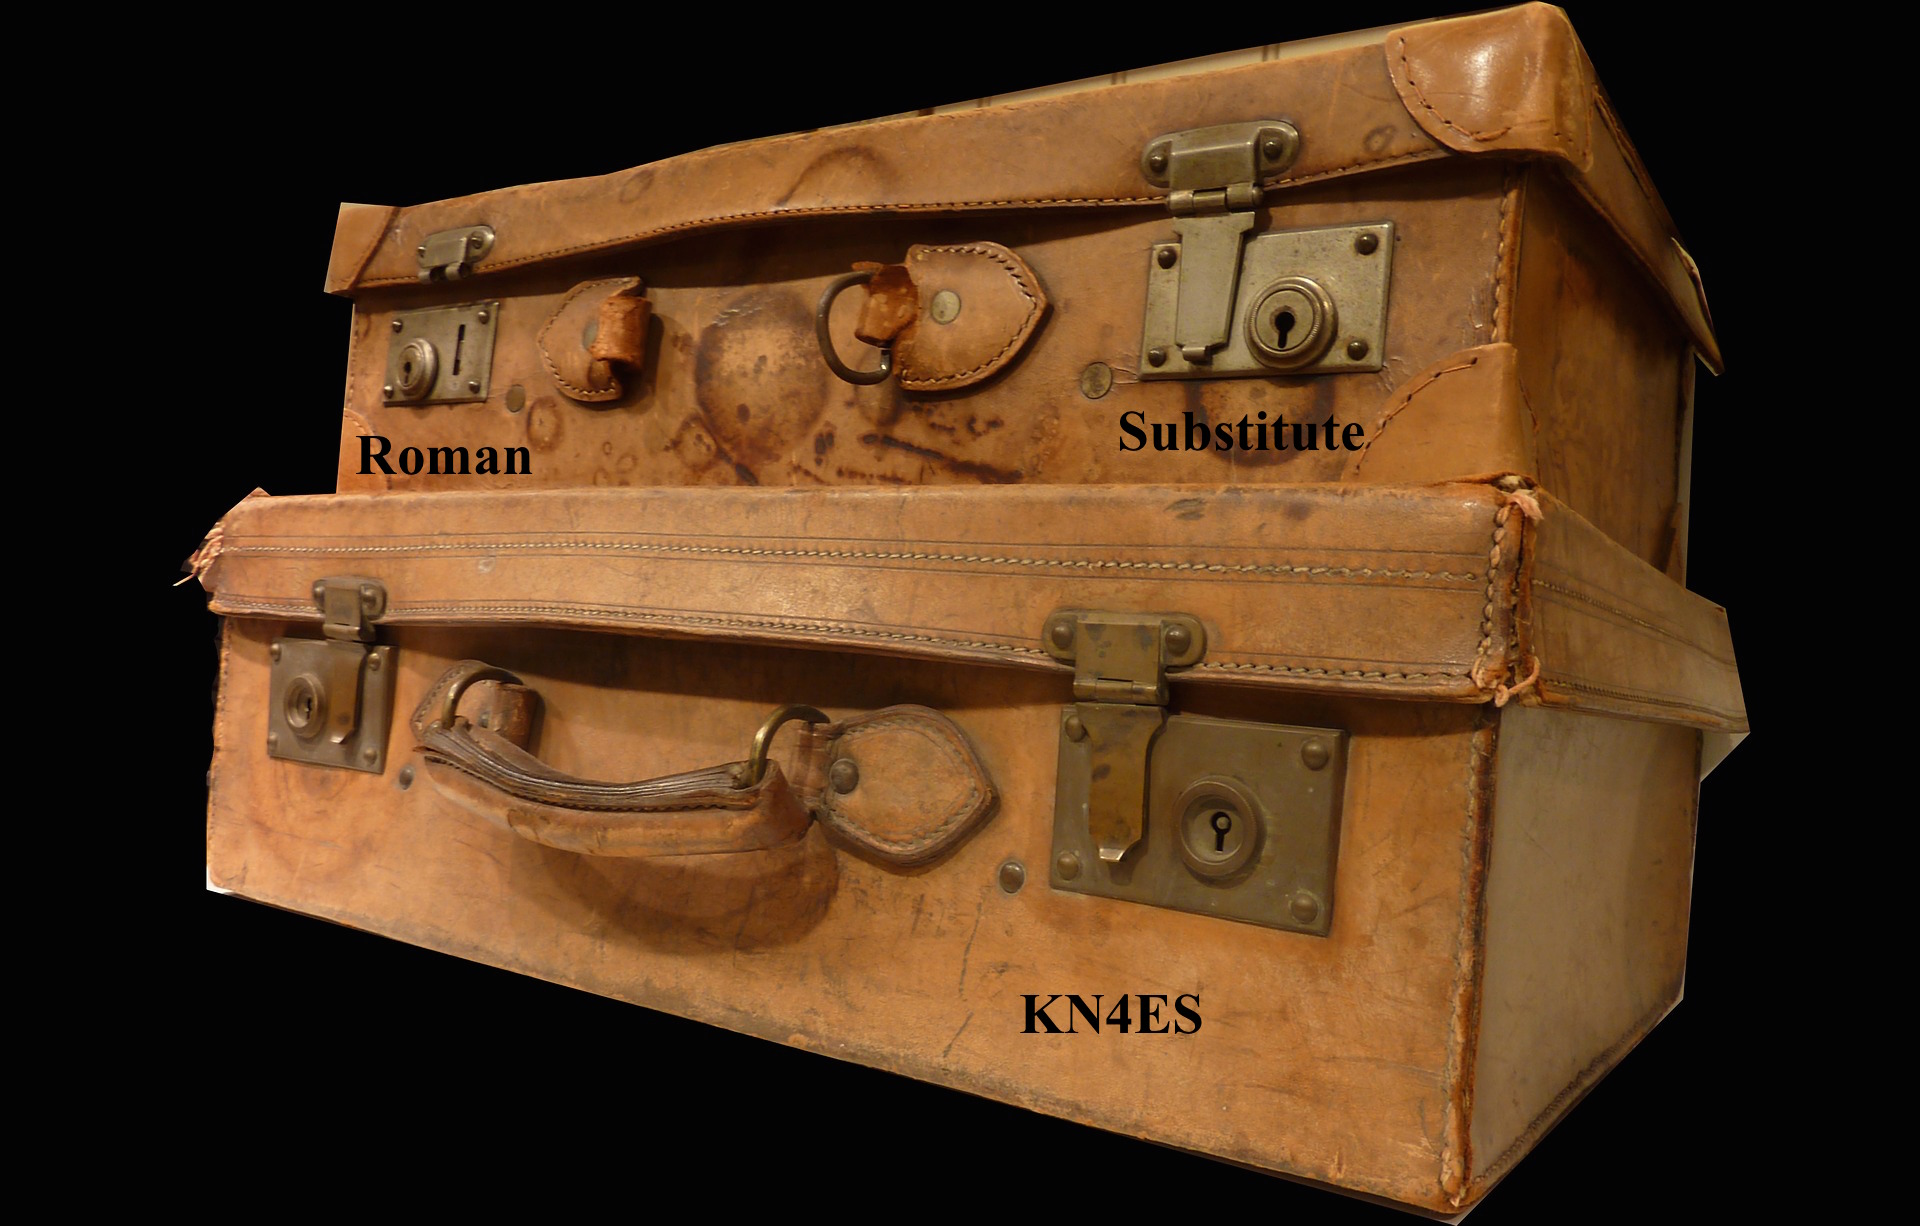 luggage-2043800_1920.jpg